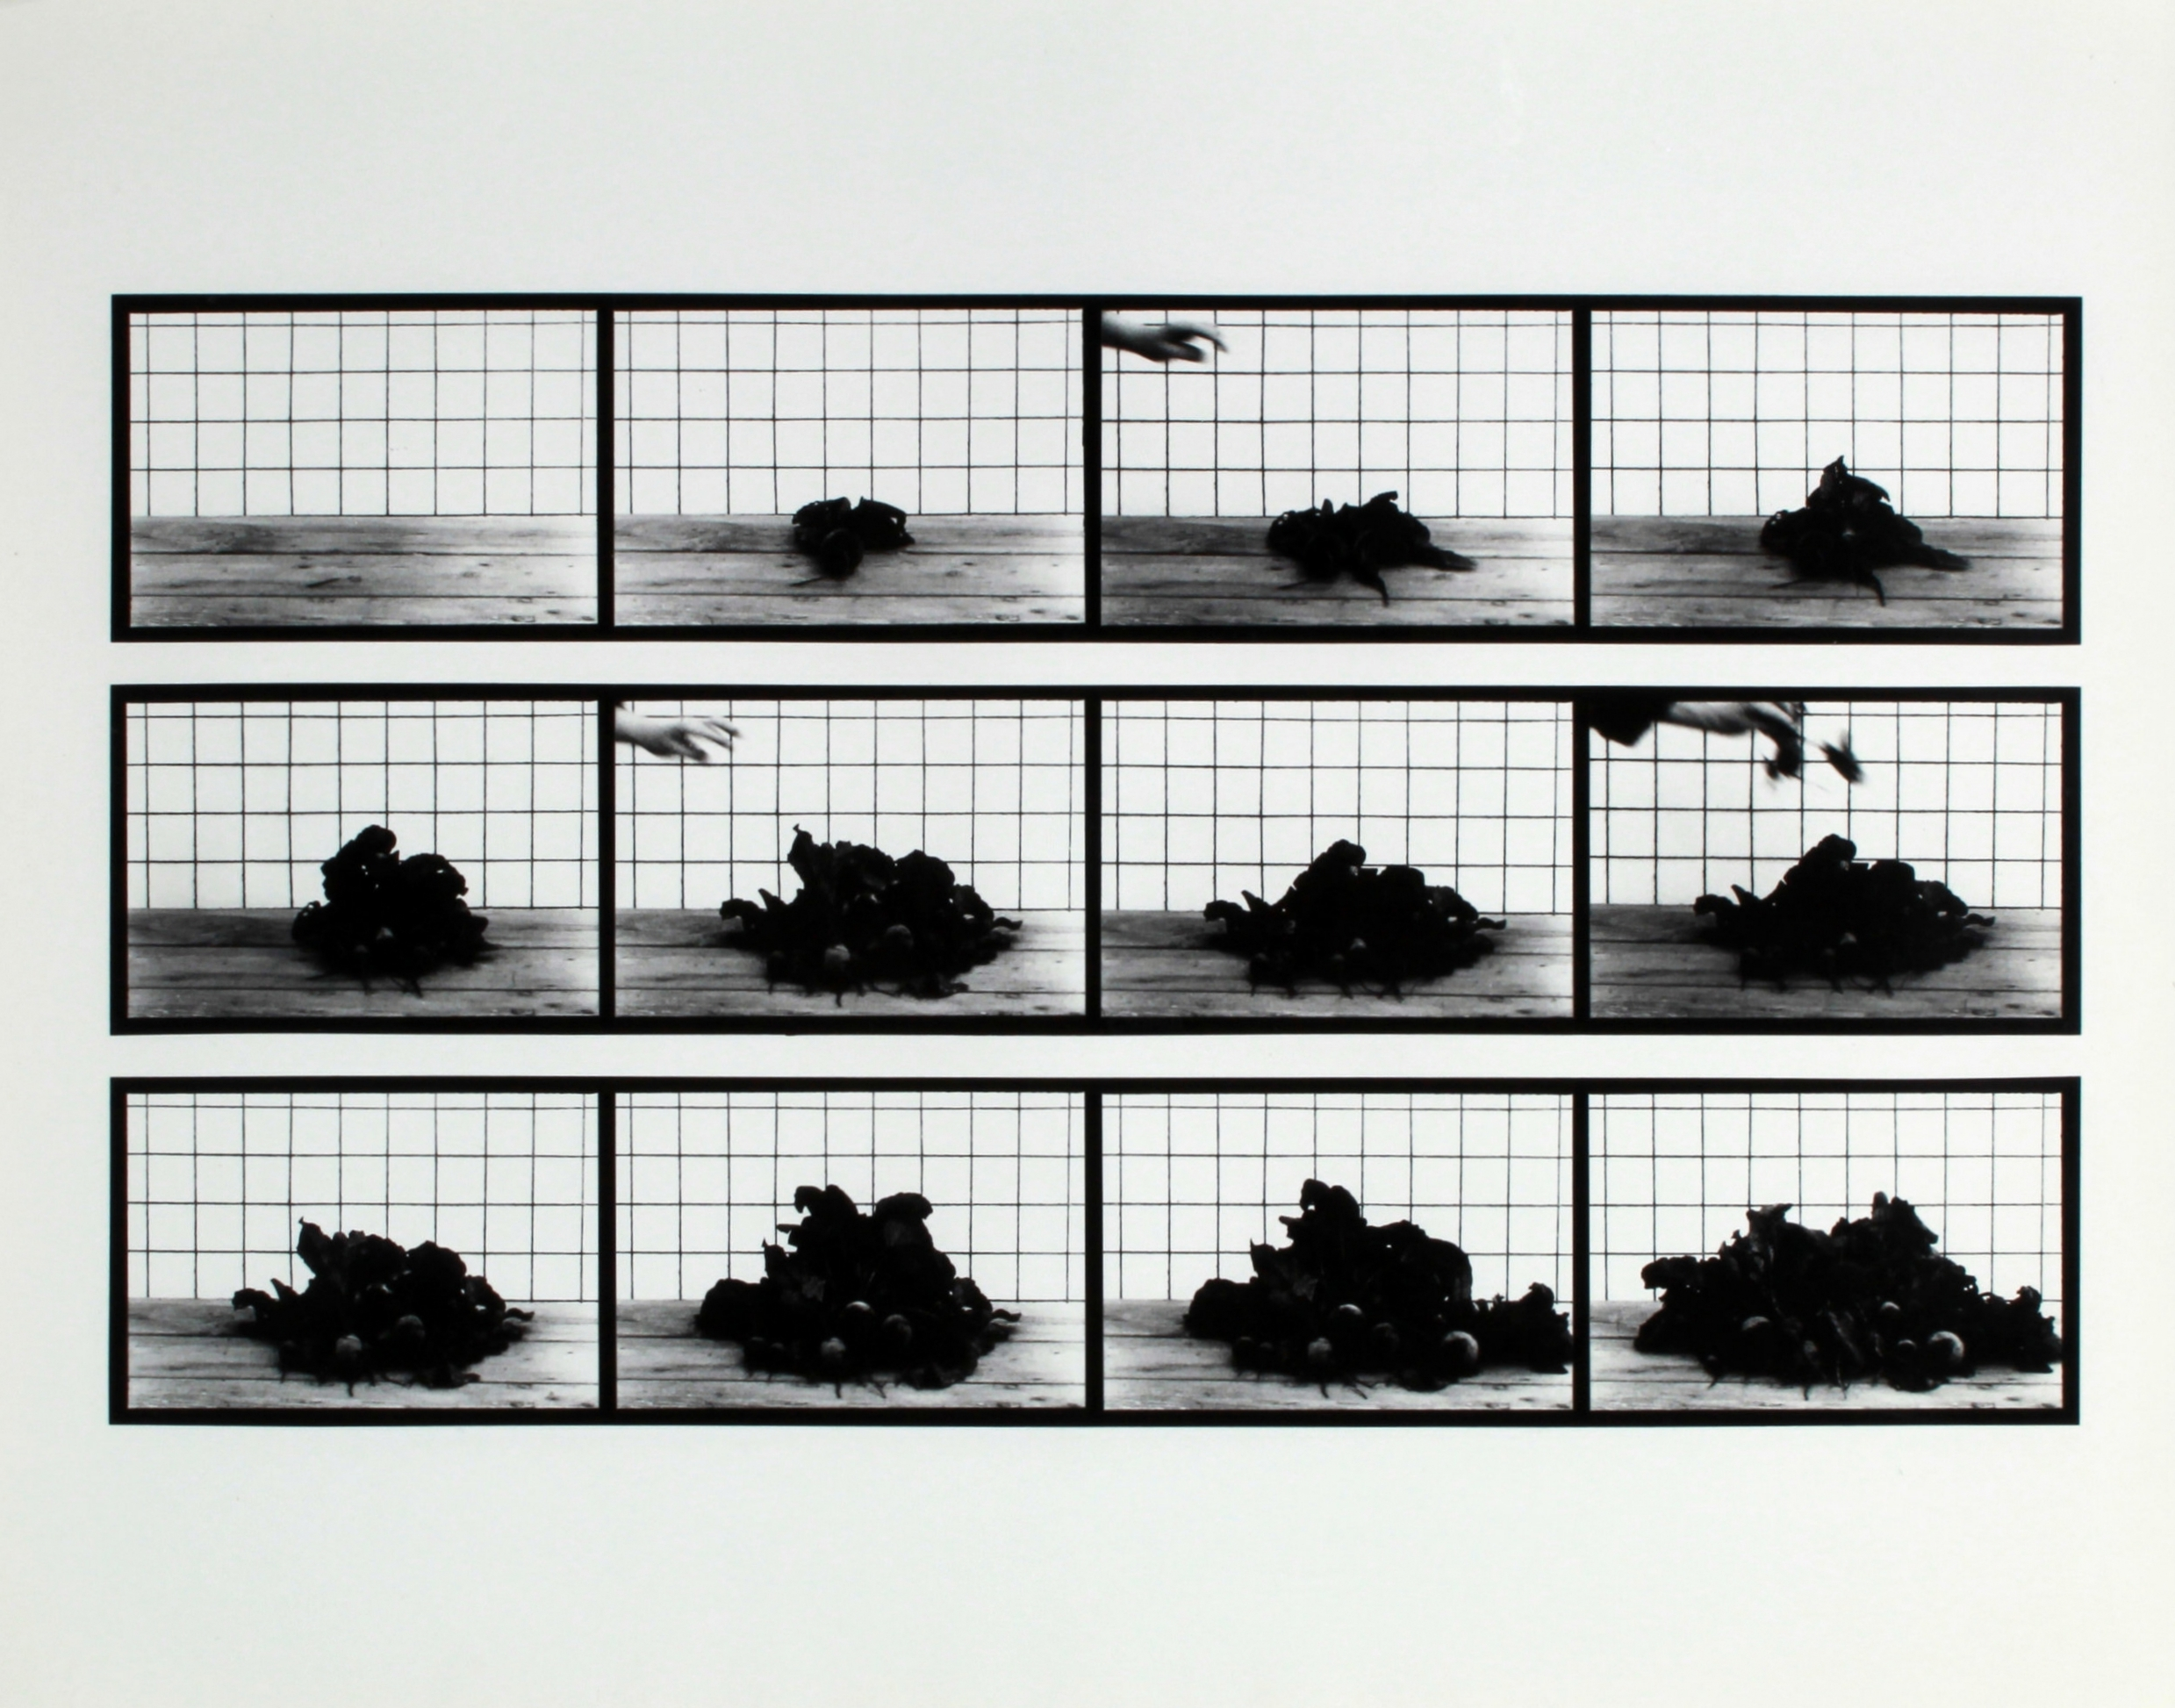 Hollis Frampton and Marion Faller | 668. Beets Assembling (1975)